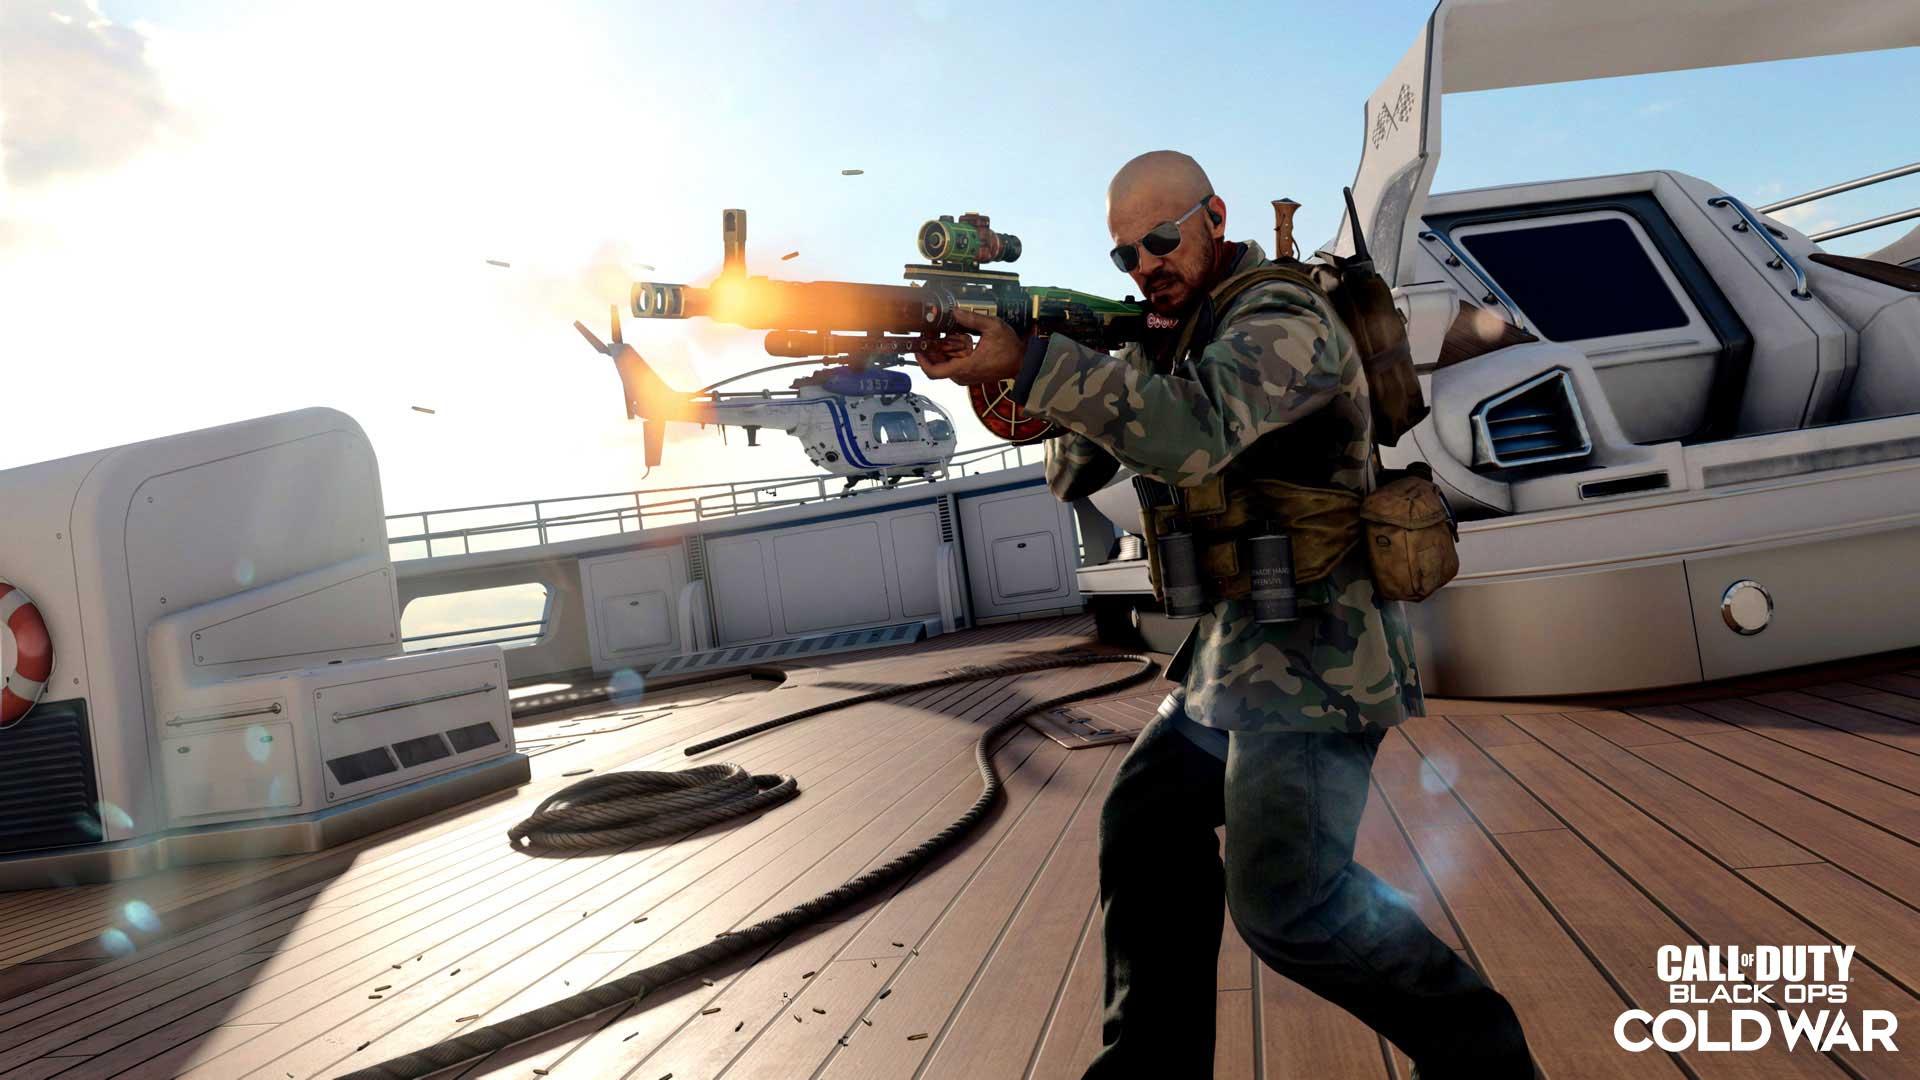 Man wielding gun on boat deck while wearing sunglasses